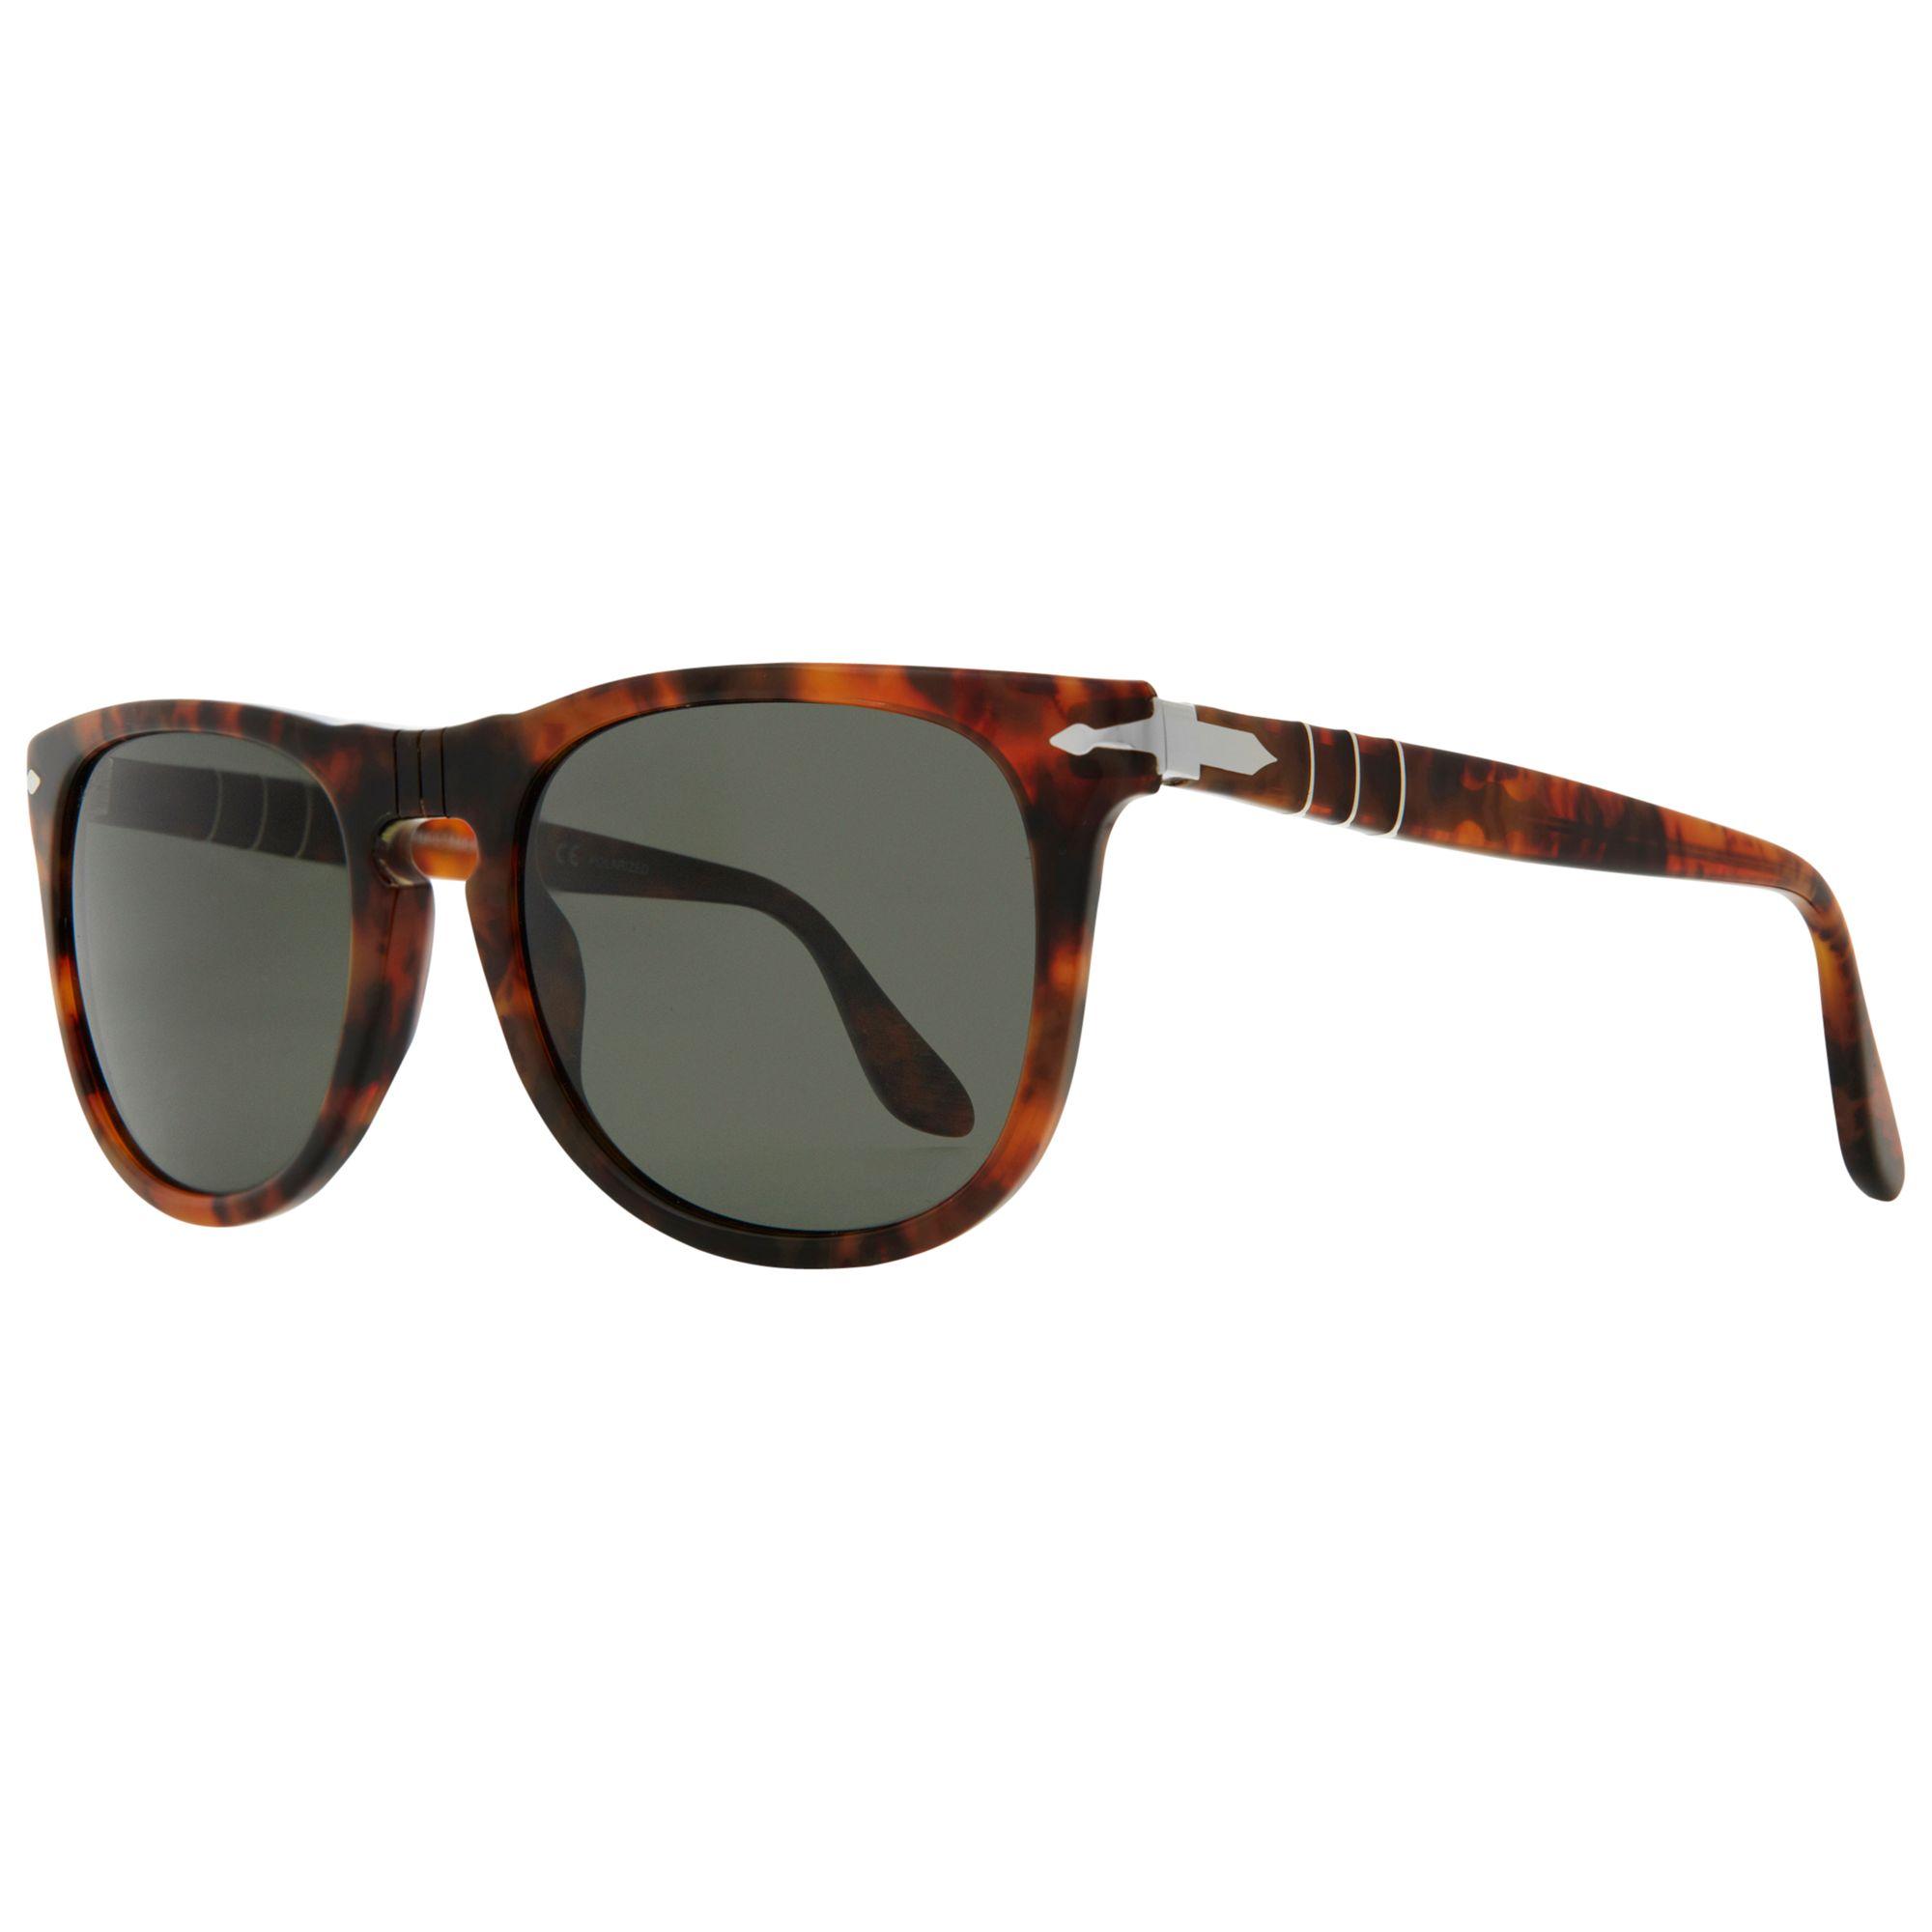 f52a209585f1 Persol PO3055S 108/58 Rectangular Polarised Sunglasses, Tortoise at John  Lewis & Partners